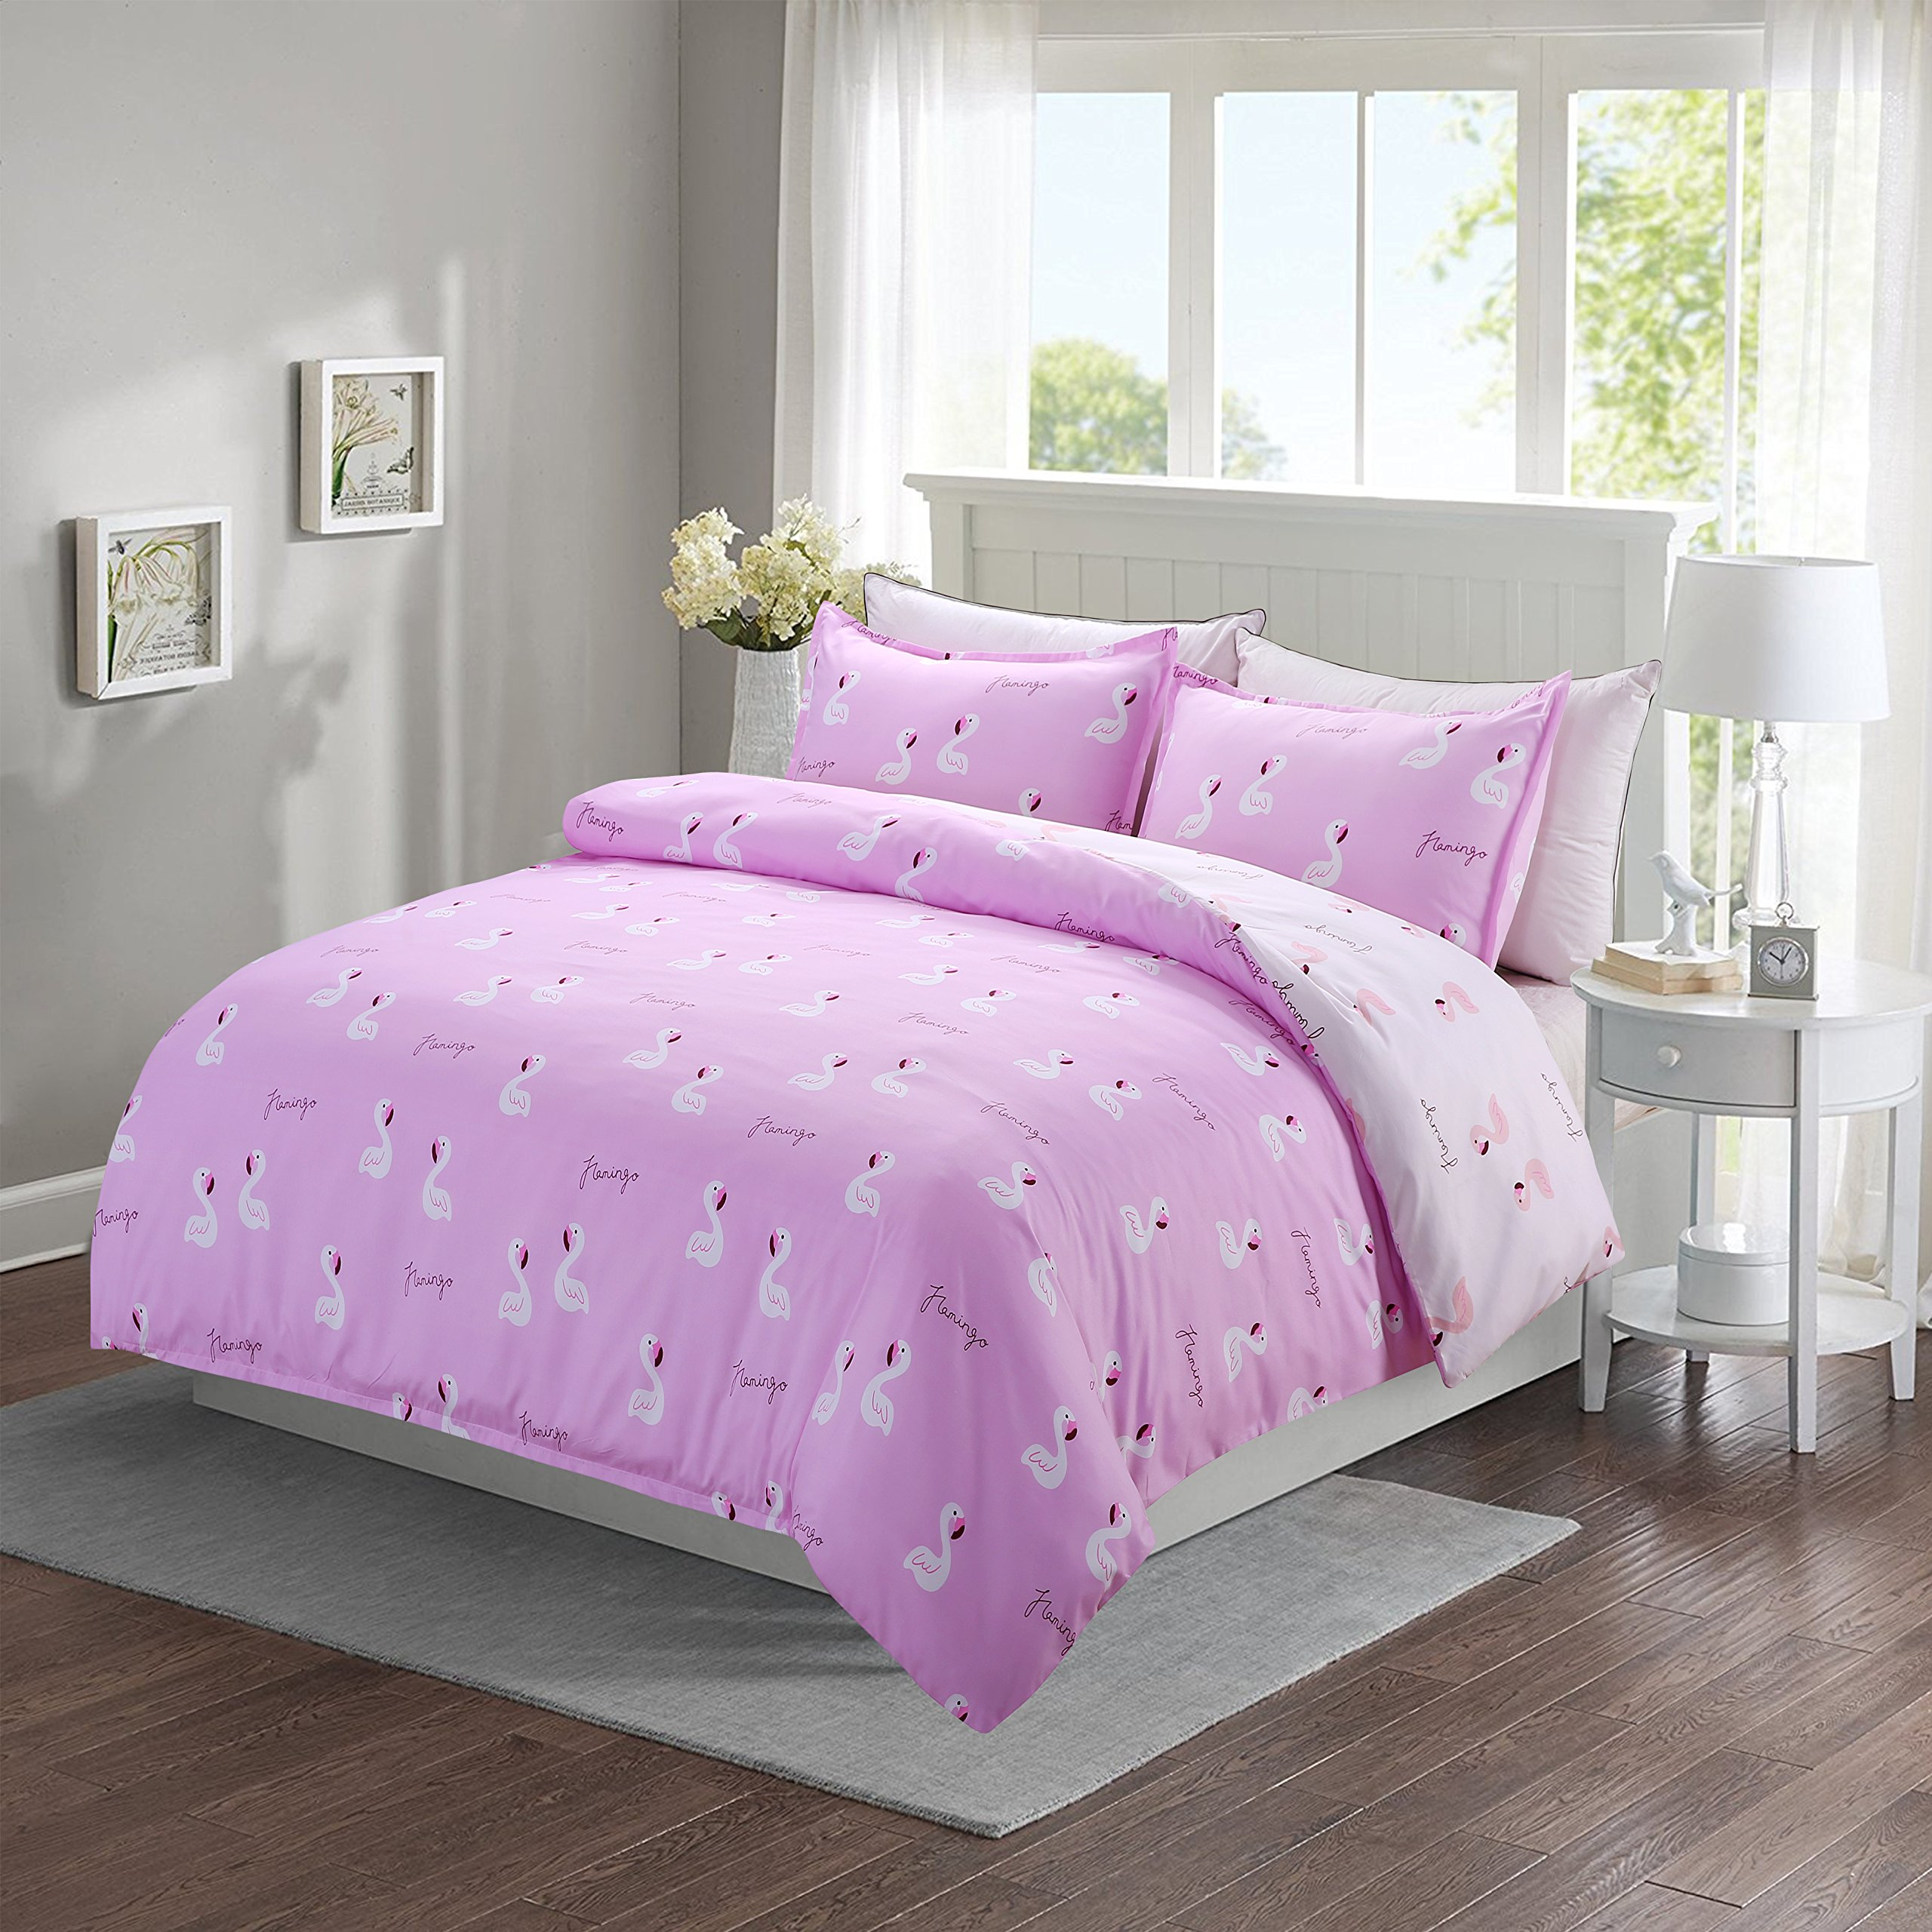 Moliy Duvet Cover Set Breathable Reversible Pink Animals Swan Ultra Soft Microfiber Bedding, Full/Queen (90''x 90''),3 Piece (1 Duvet Cover + 2 Pillow Shams)